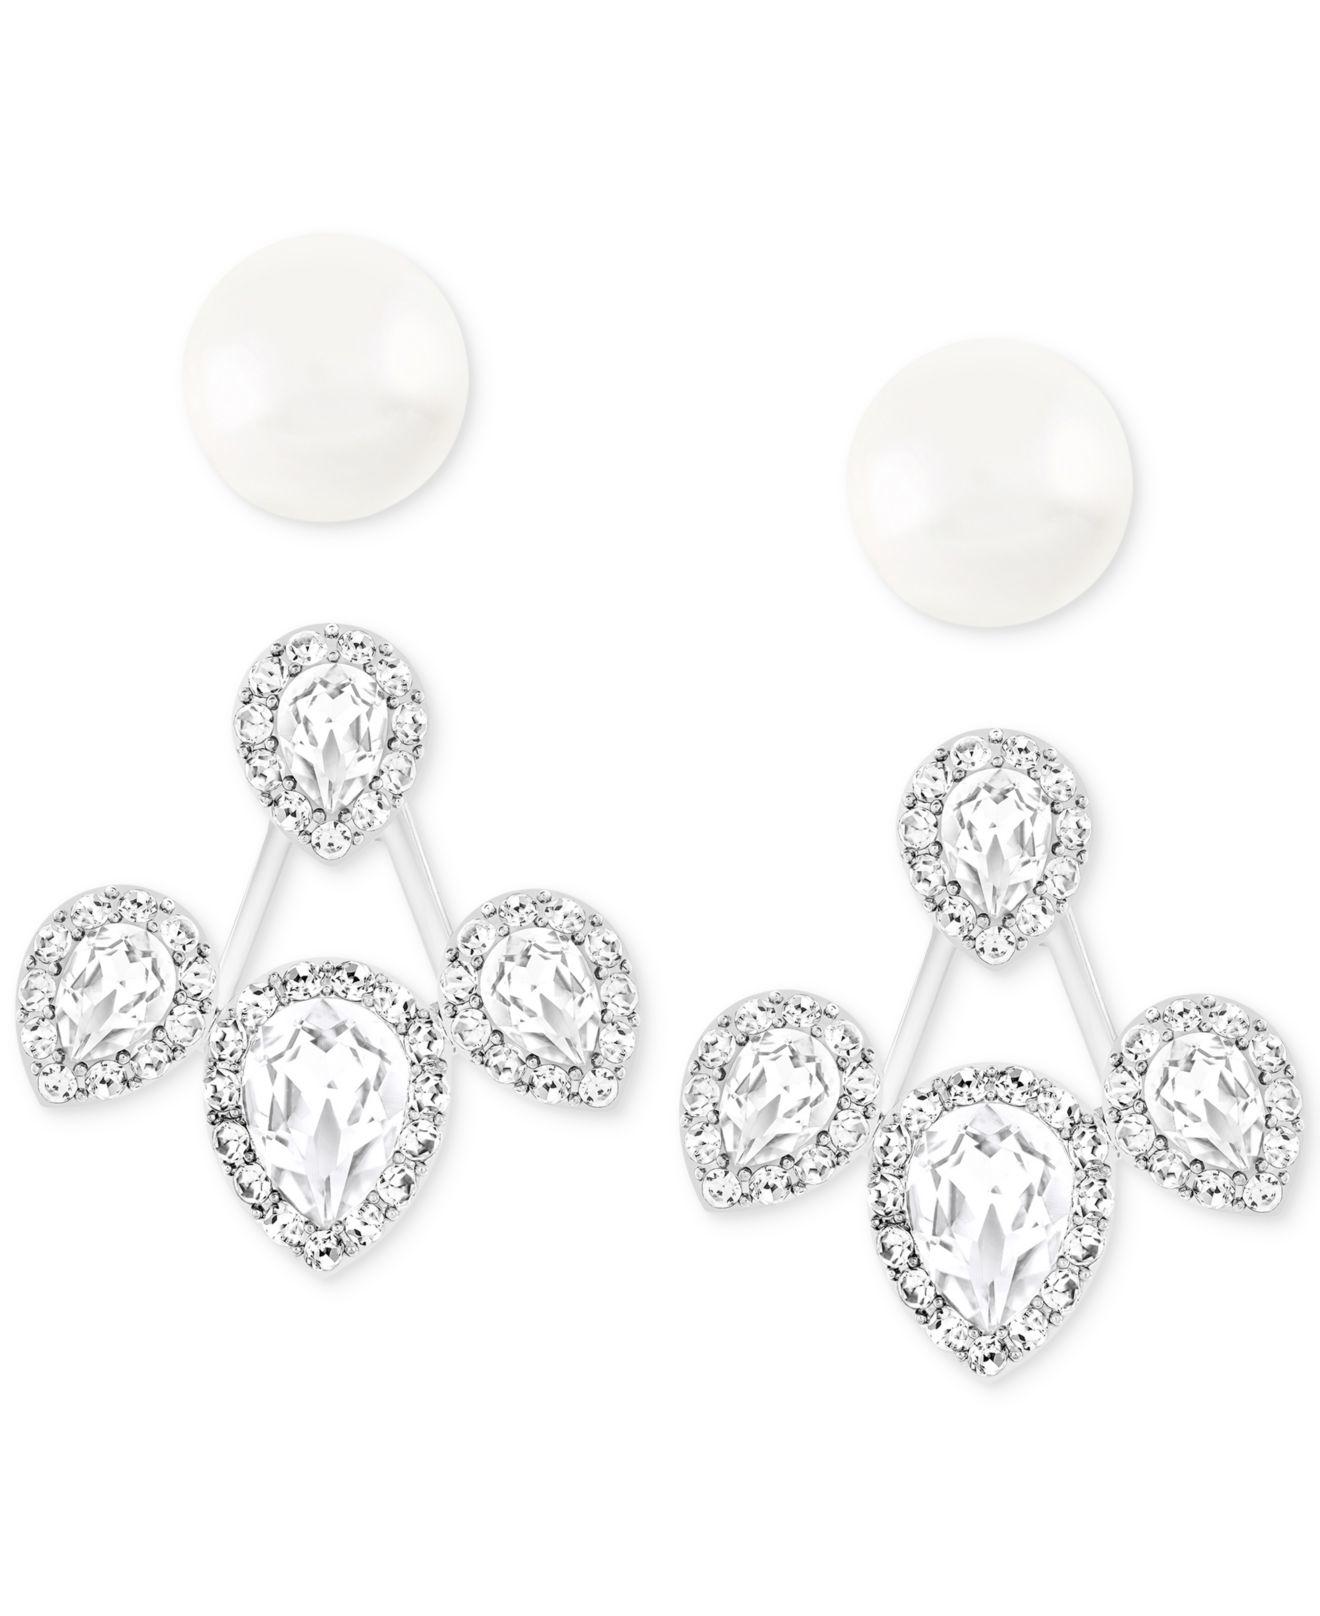 Swarovski Christie Pearl Stud And Crystal Jacket Earring Set In